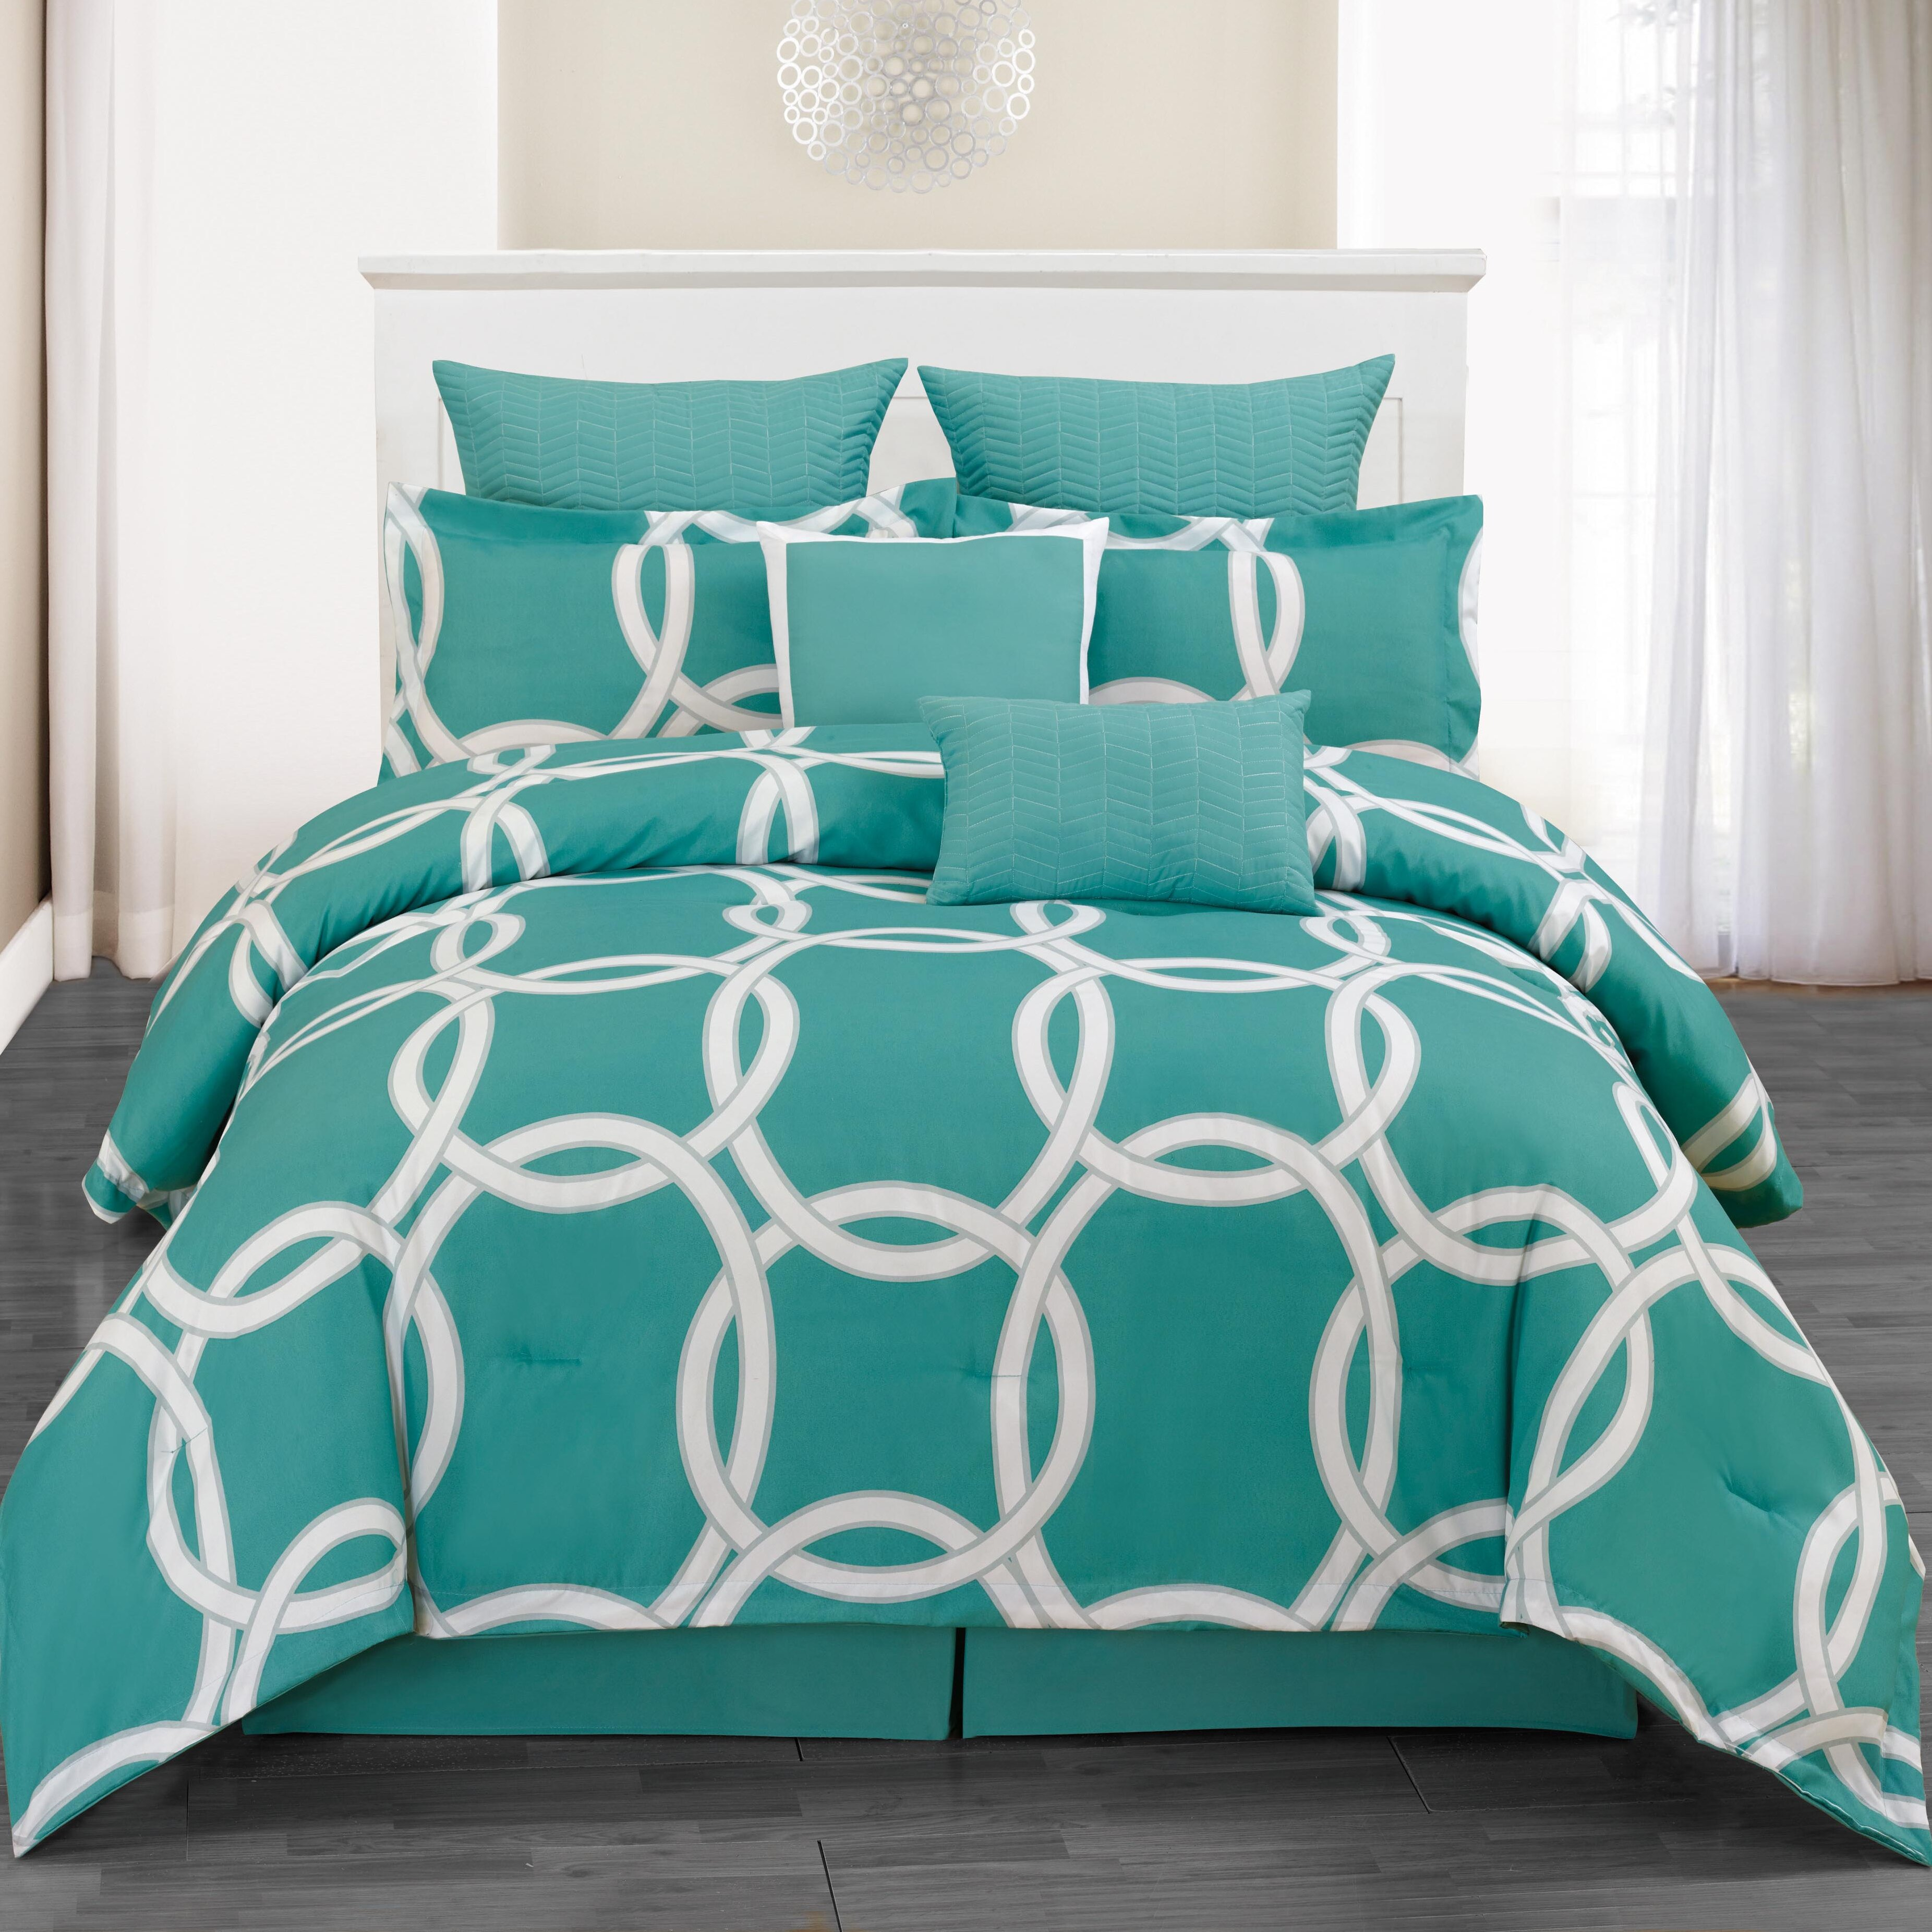 DR International Redington 8 Piece Comforter Set. DR International Redington 8 Piece Comforter Set   Reviews   Wayfair